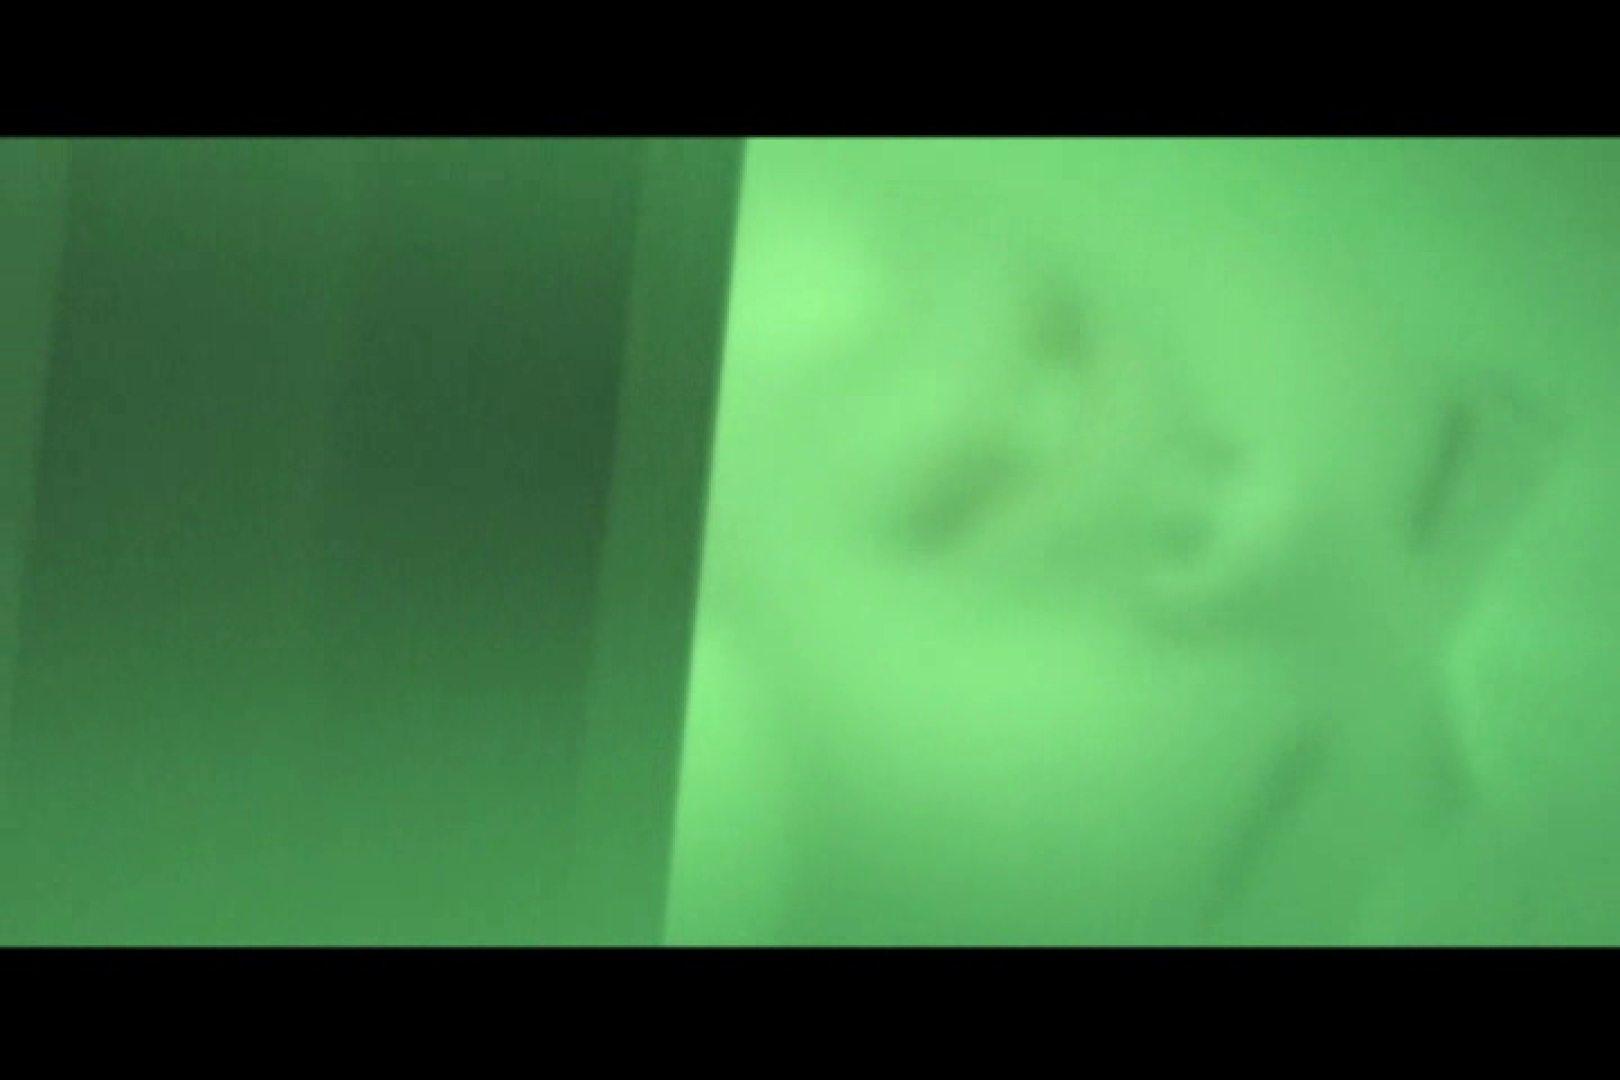 独占配信!無修正! 看護女子寮 vol.12 ナースのエロ動画 SEX無修正画像 78PIX 17